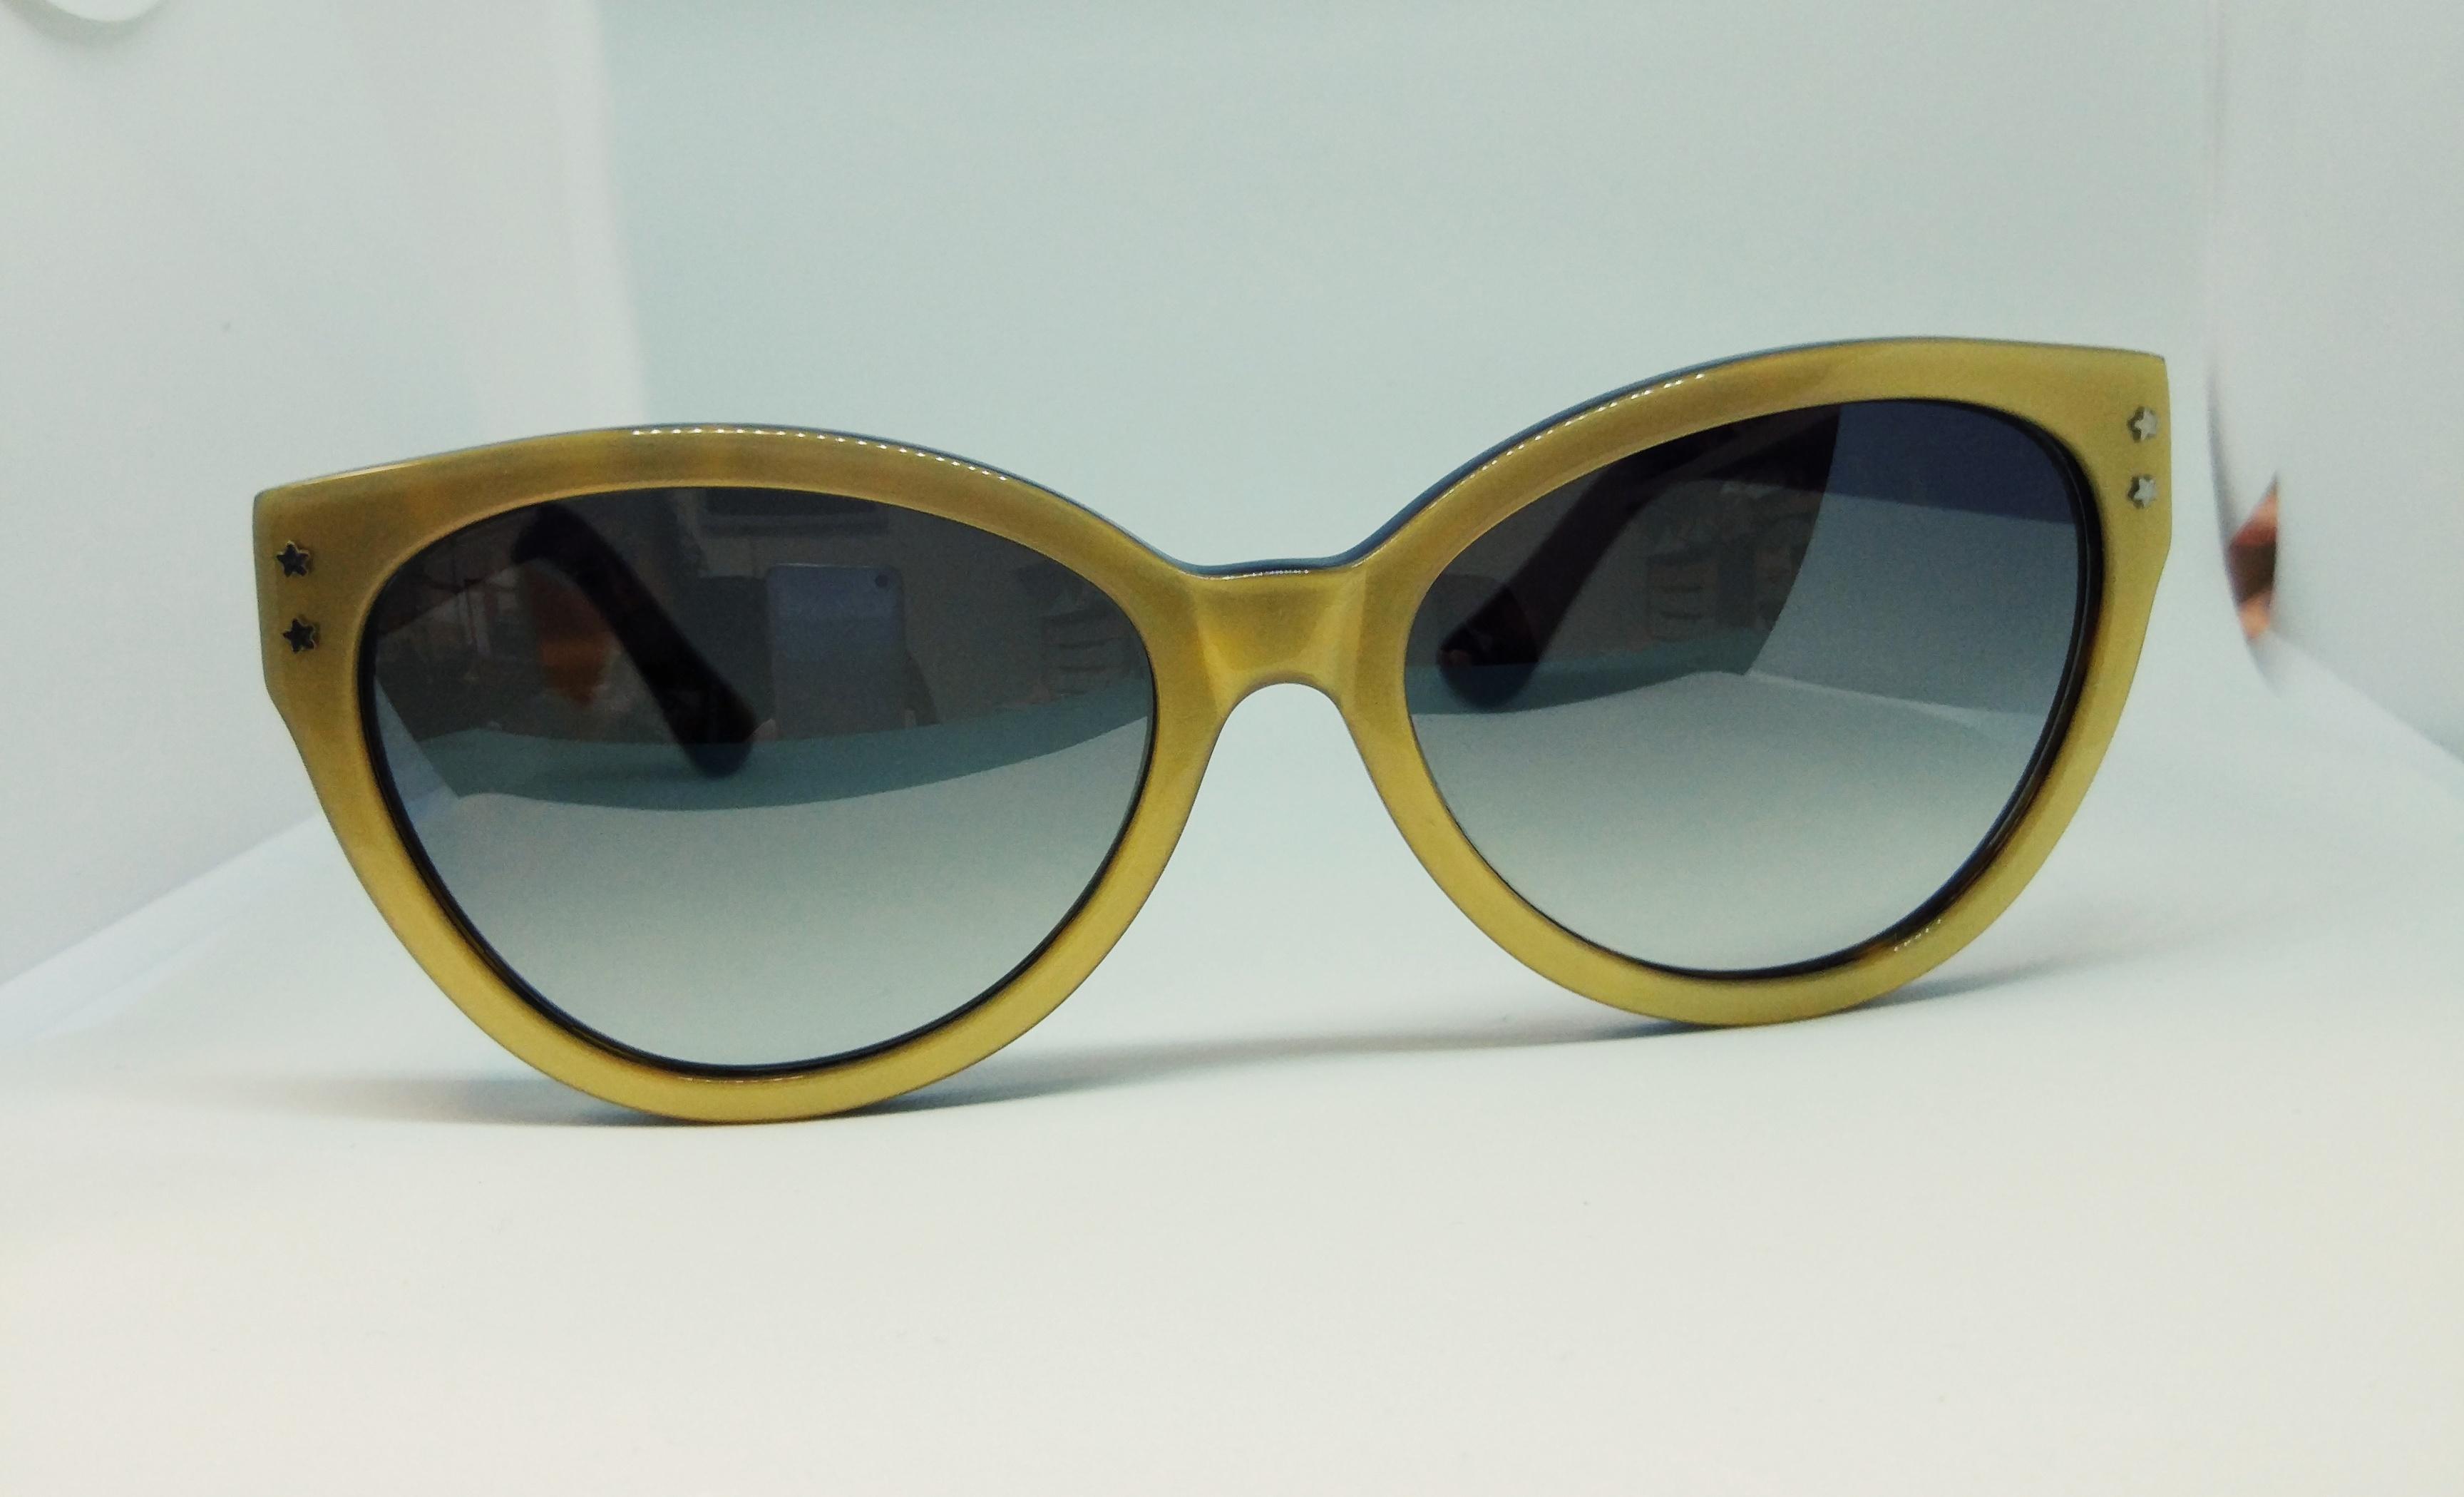 Cutler And Gross Modelo 0886 gold on dark turtle de frente